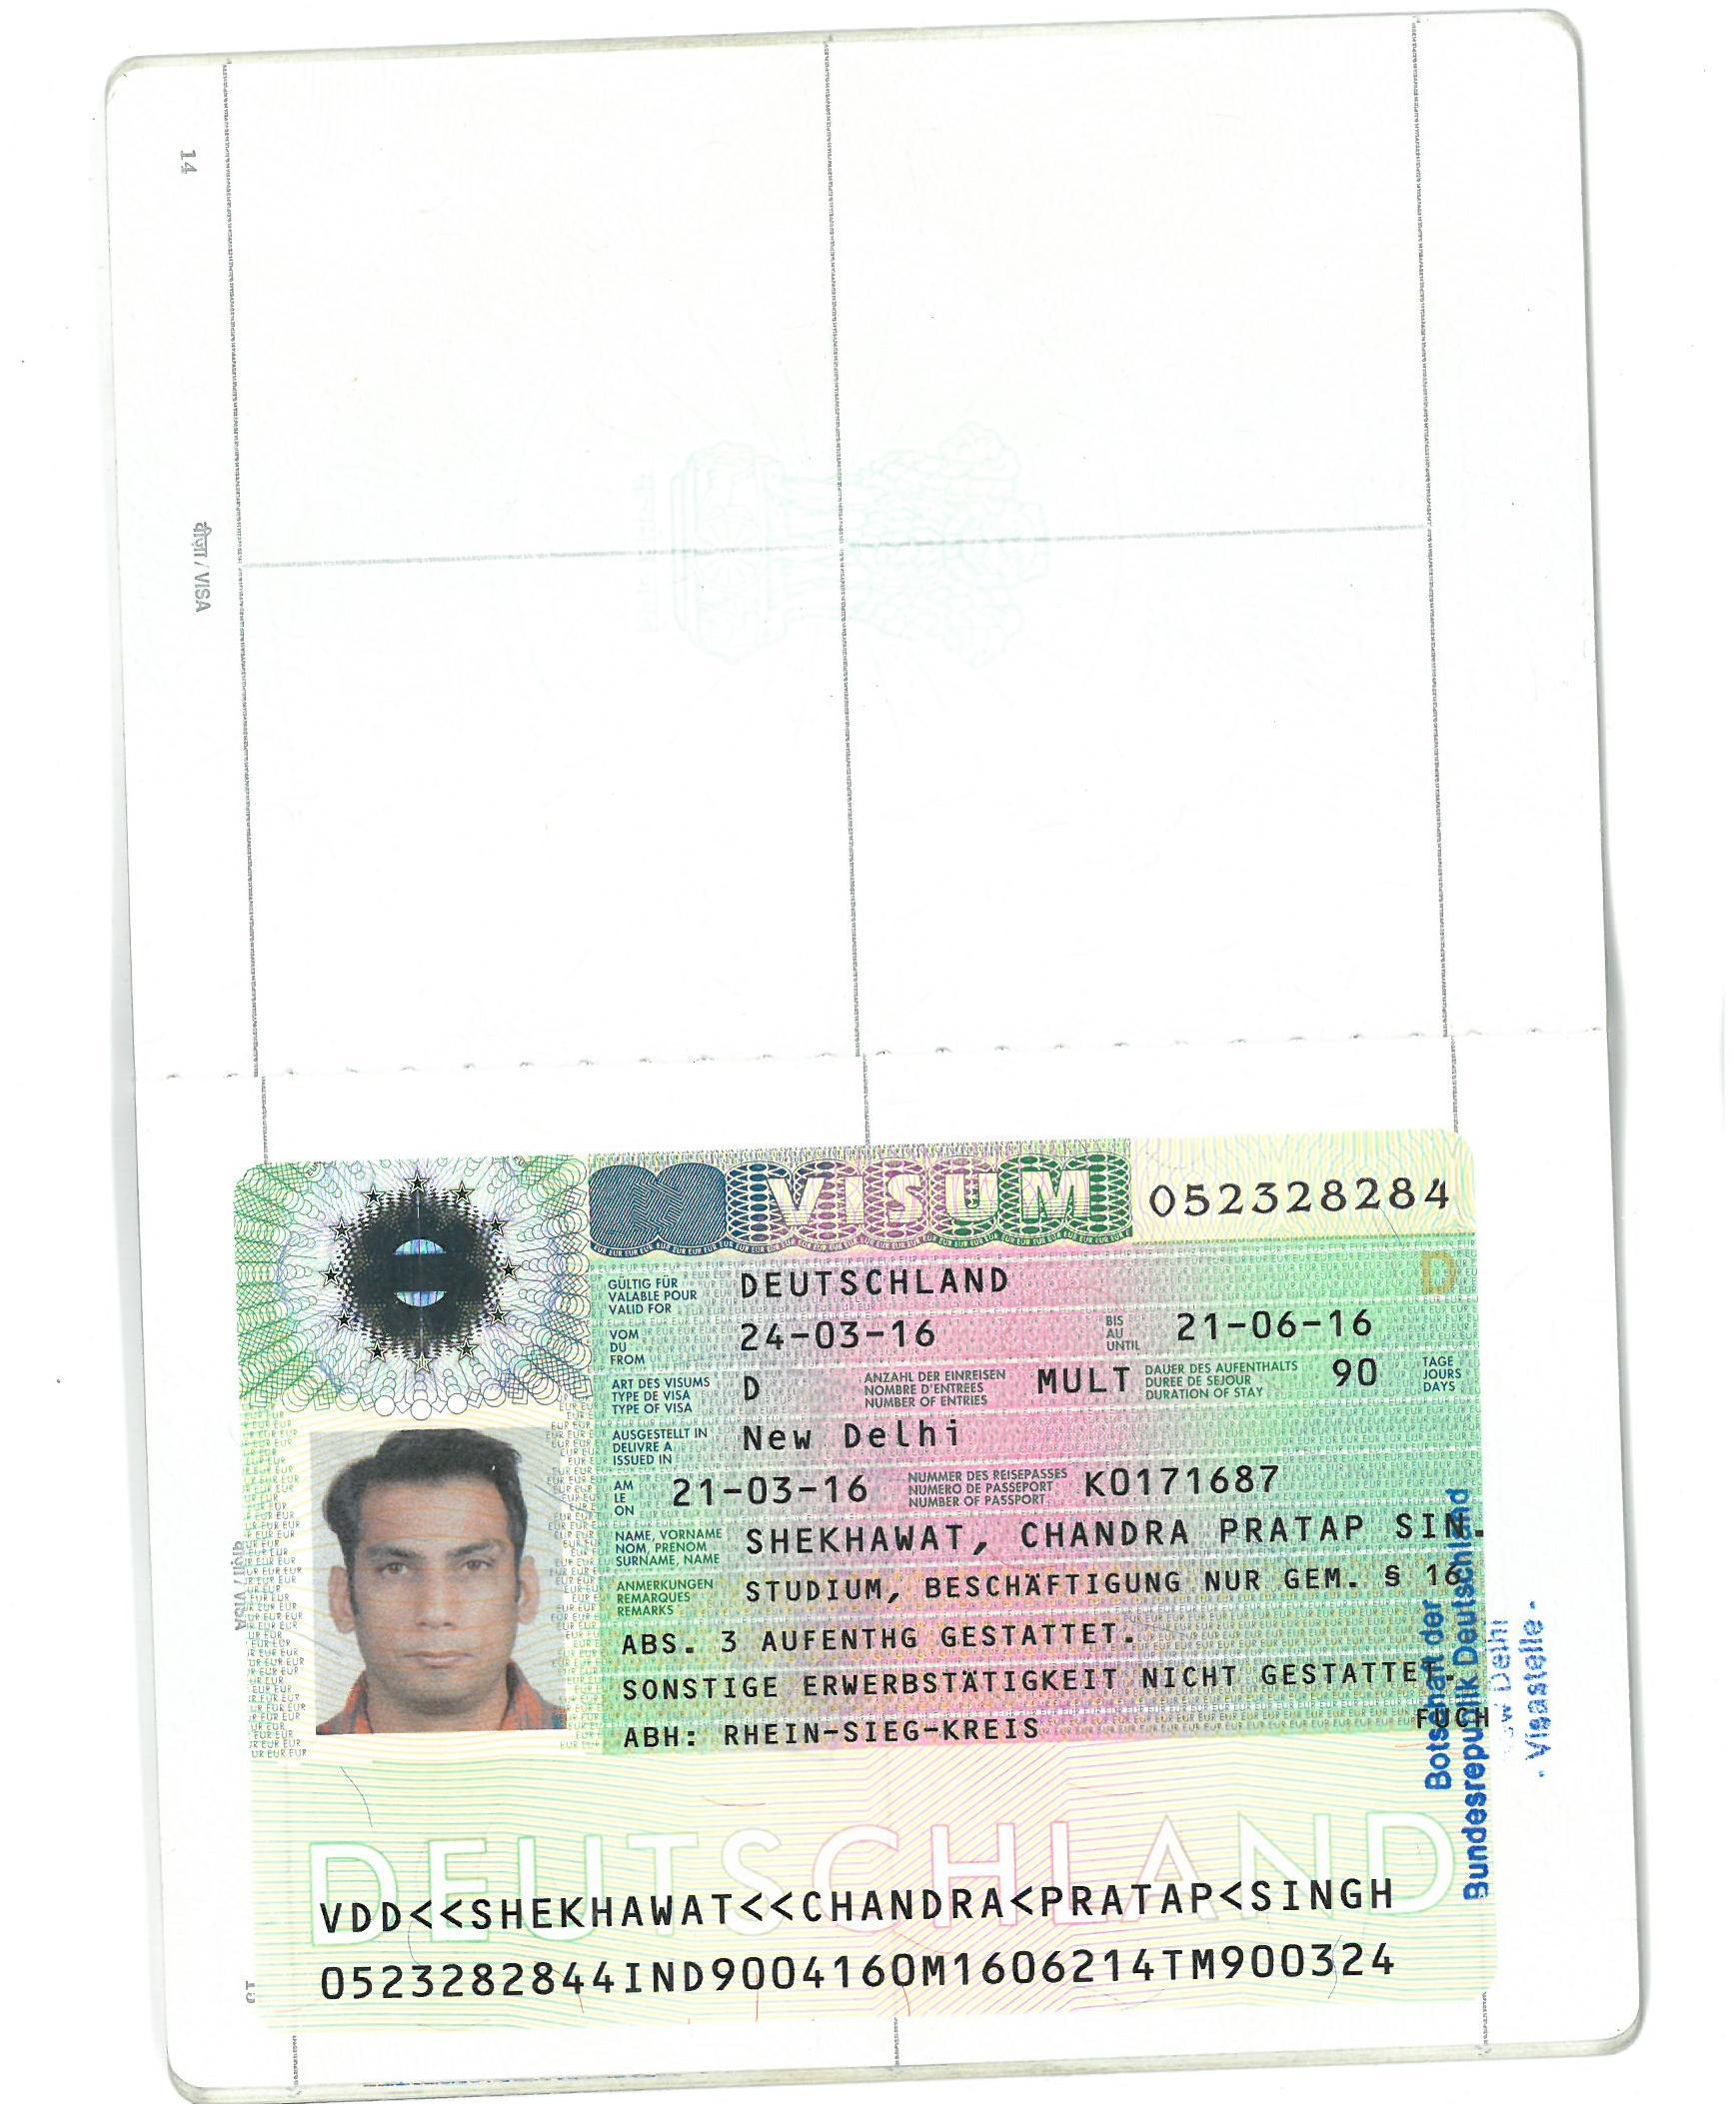 Chandra Pratap visa copy_www.lnconsultancy.com